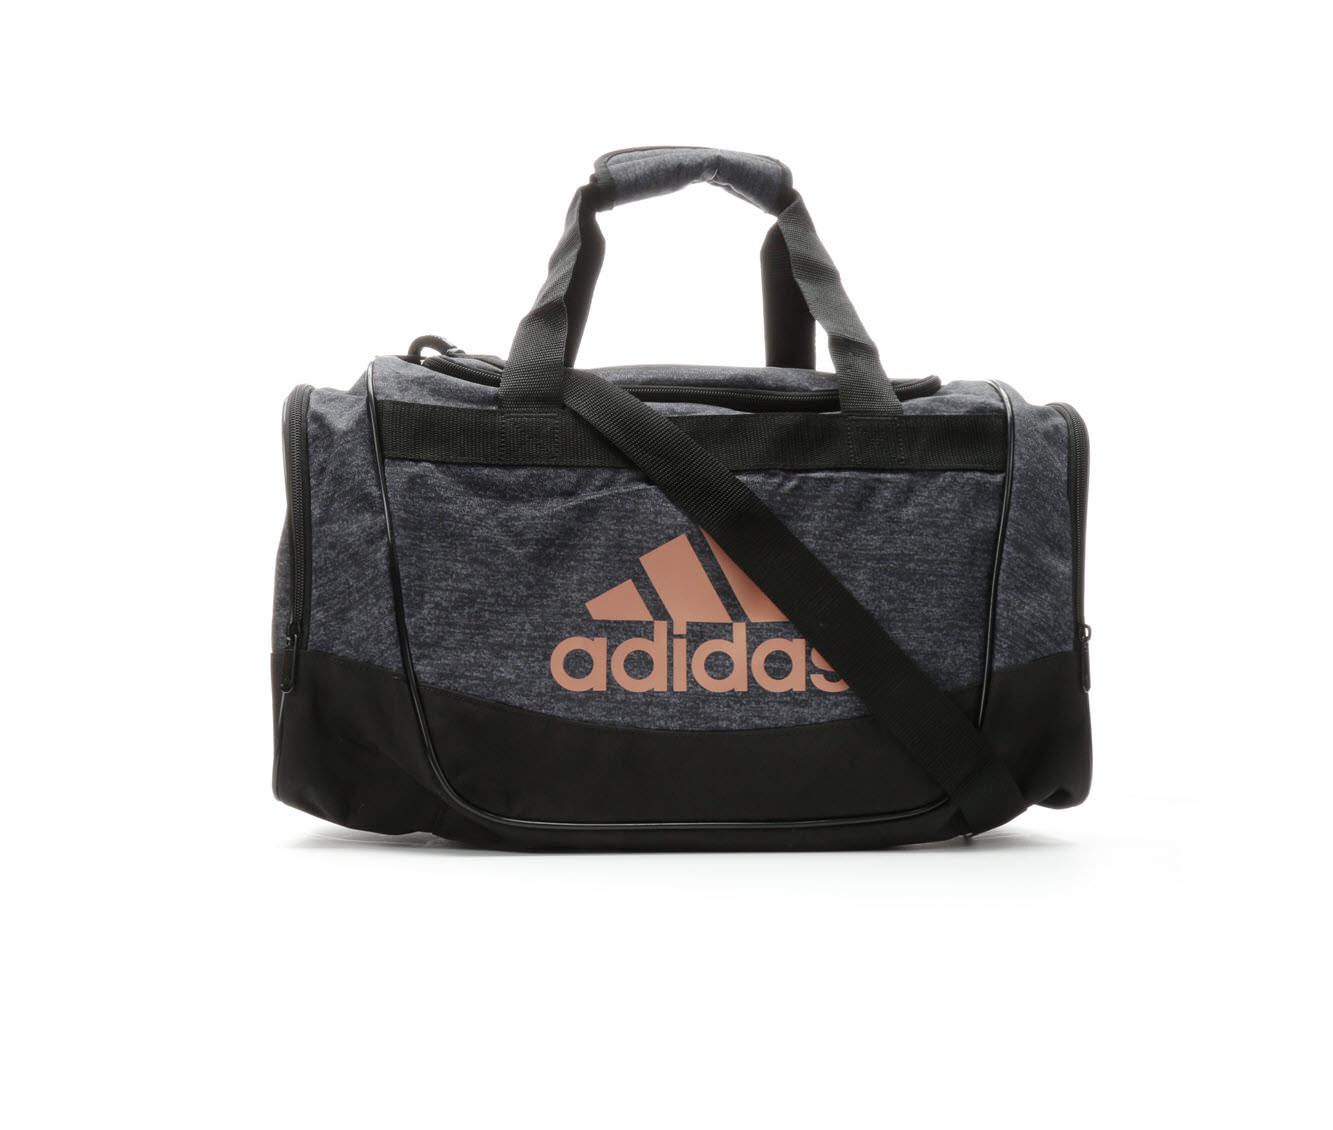 Image of Adidas Defender II Small Duffel Bag (Black - Size UNSZ)